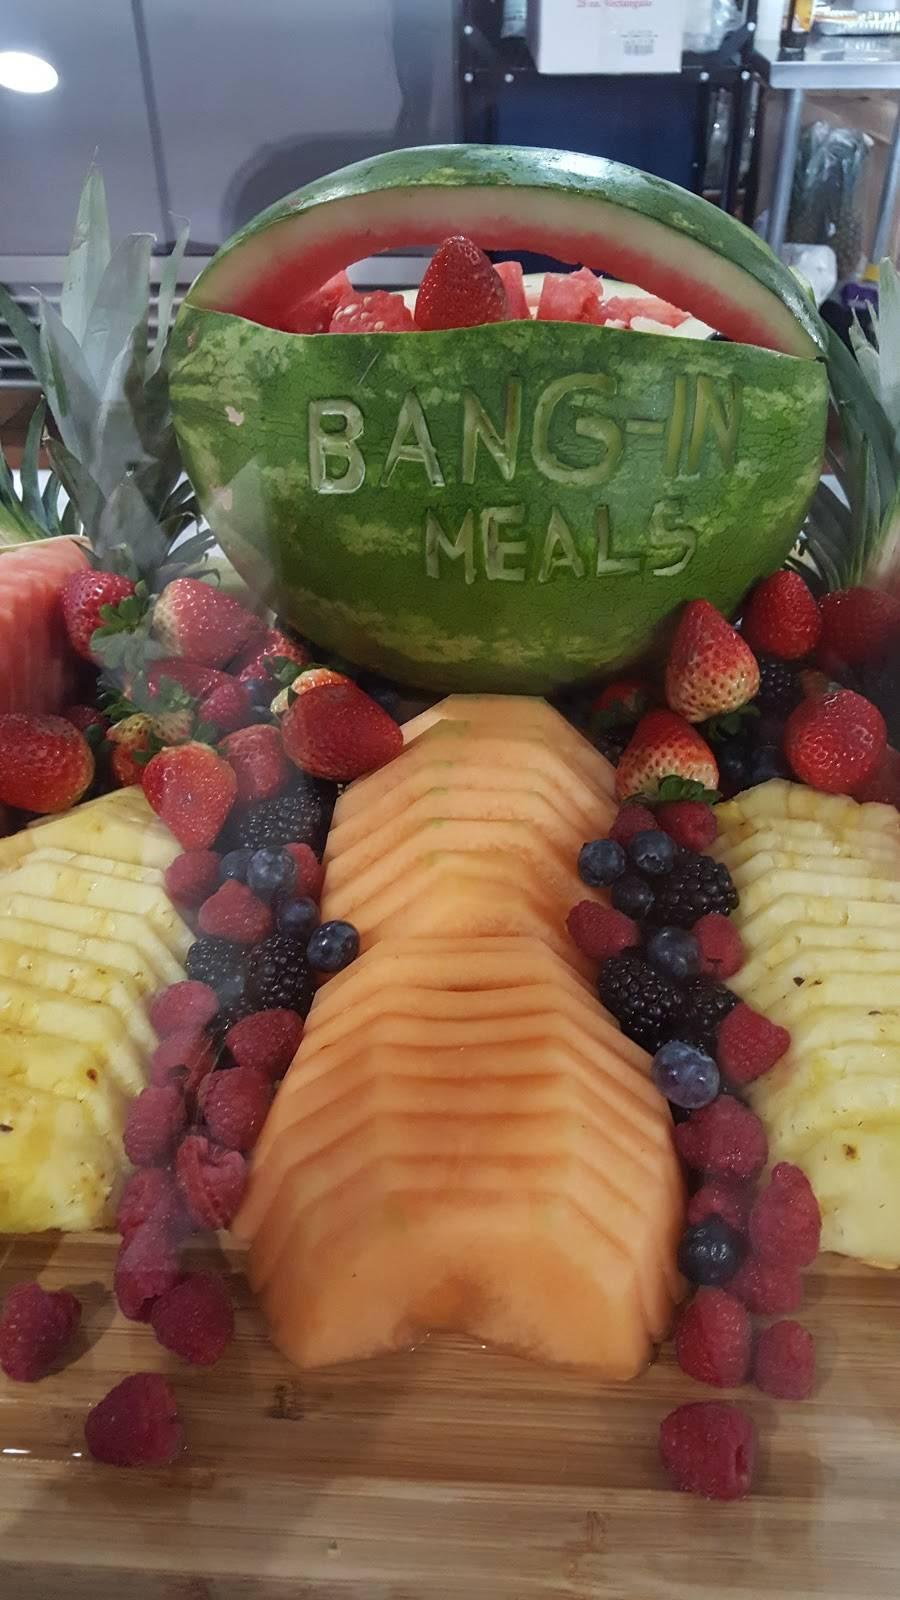 Bangin Meals   restaurant   663 Glendora Ave, La Puente, CA 91746, United States   6264364186 OR +1 626-436-4186